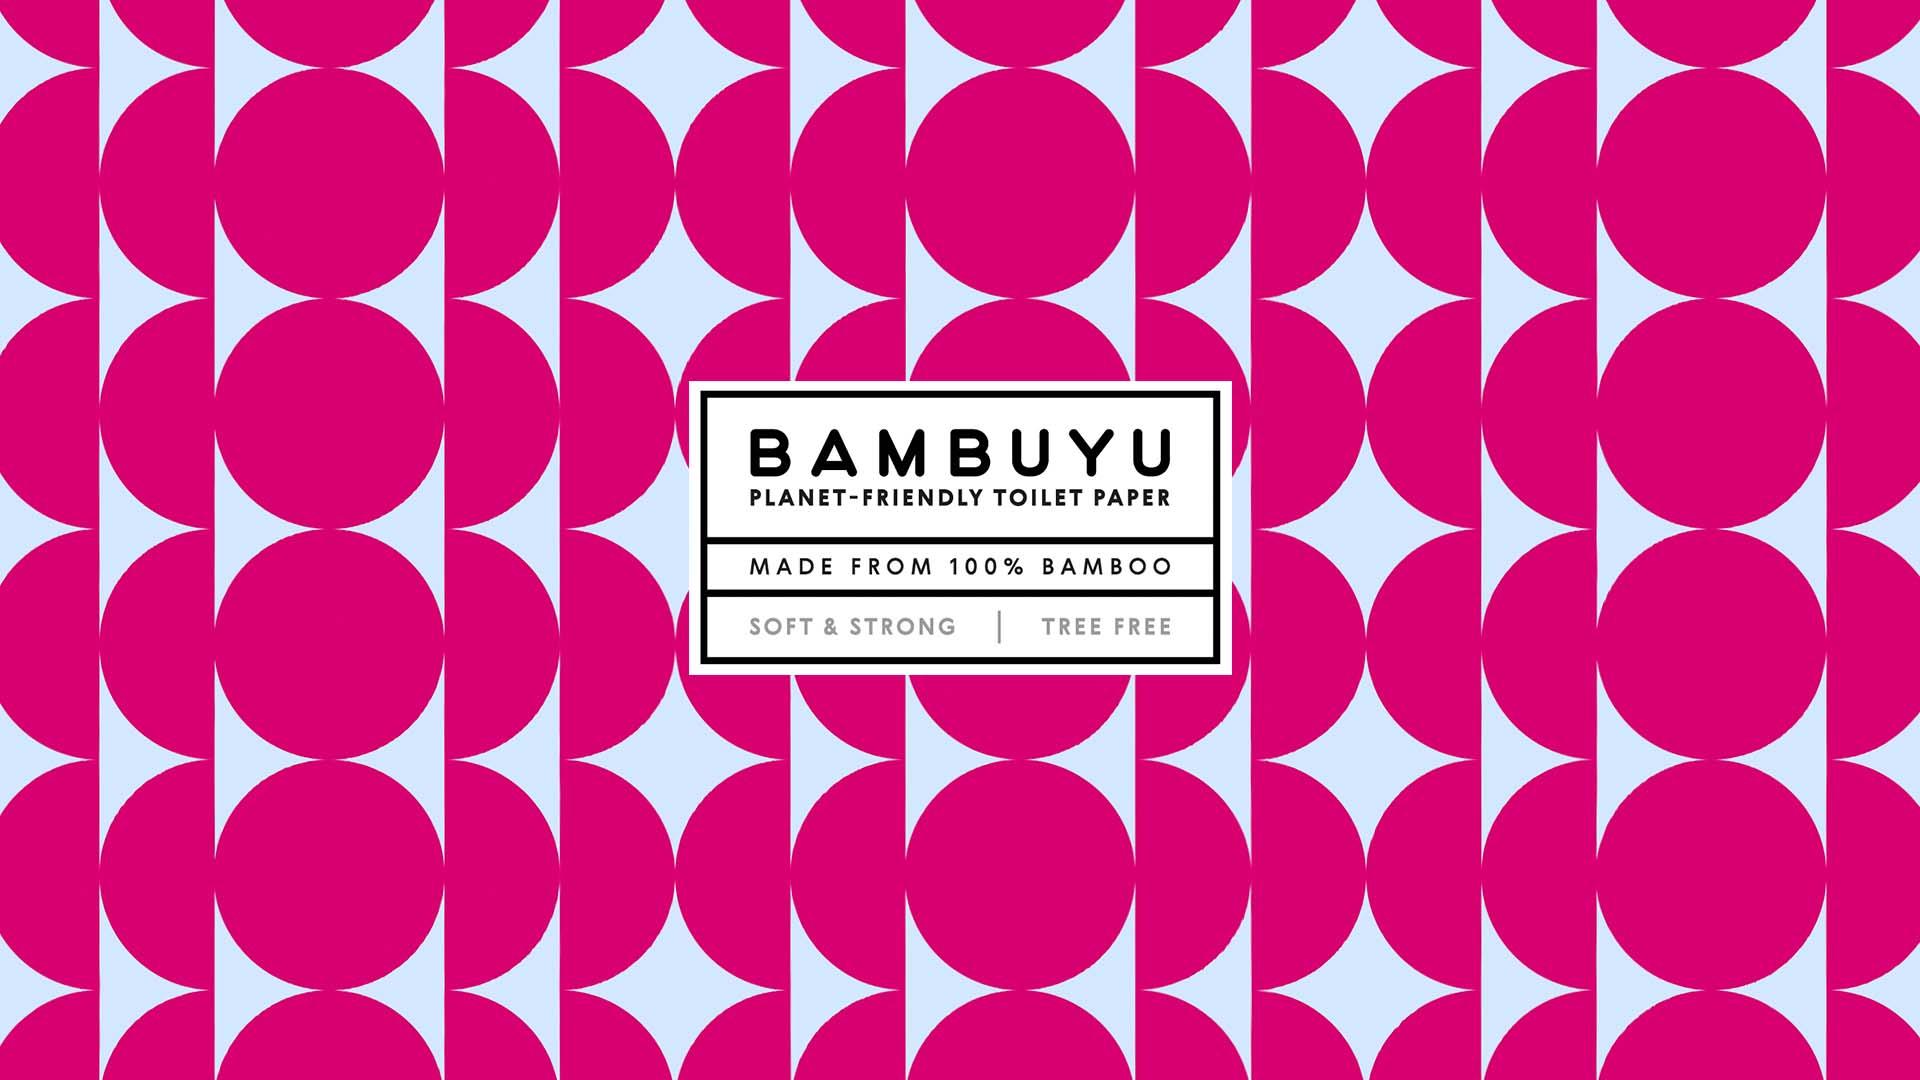 Bright Bamboo Toilet Paper BambuYu